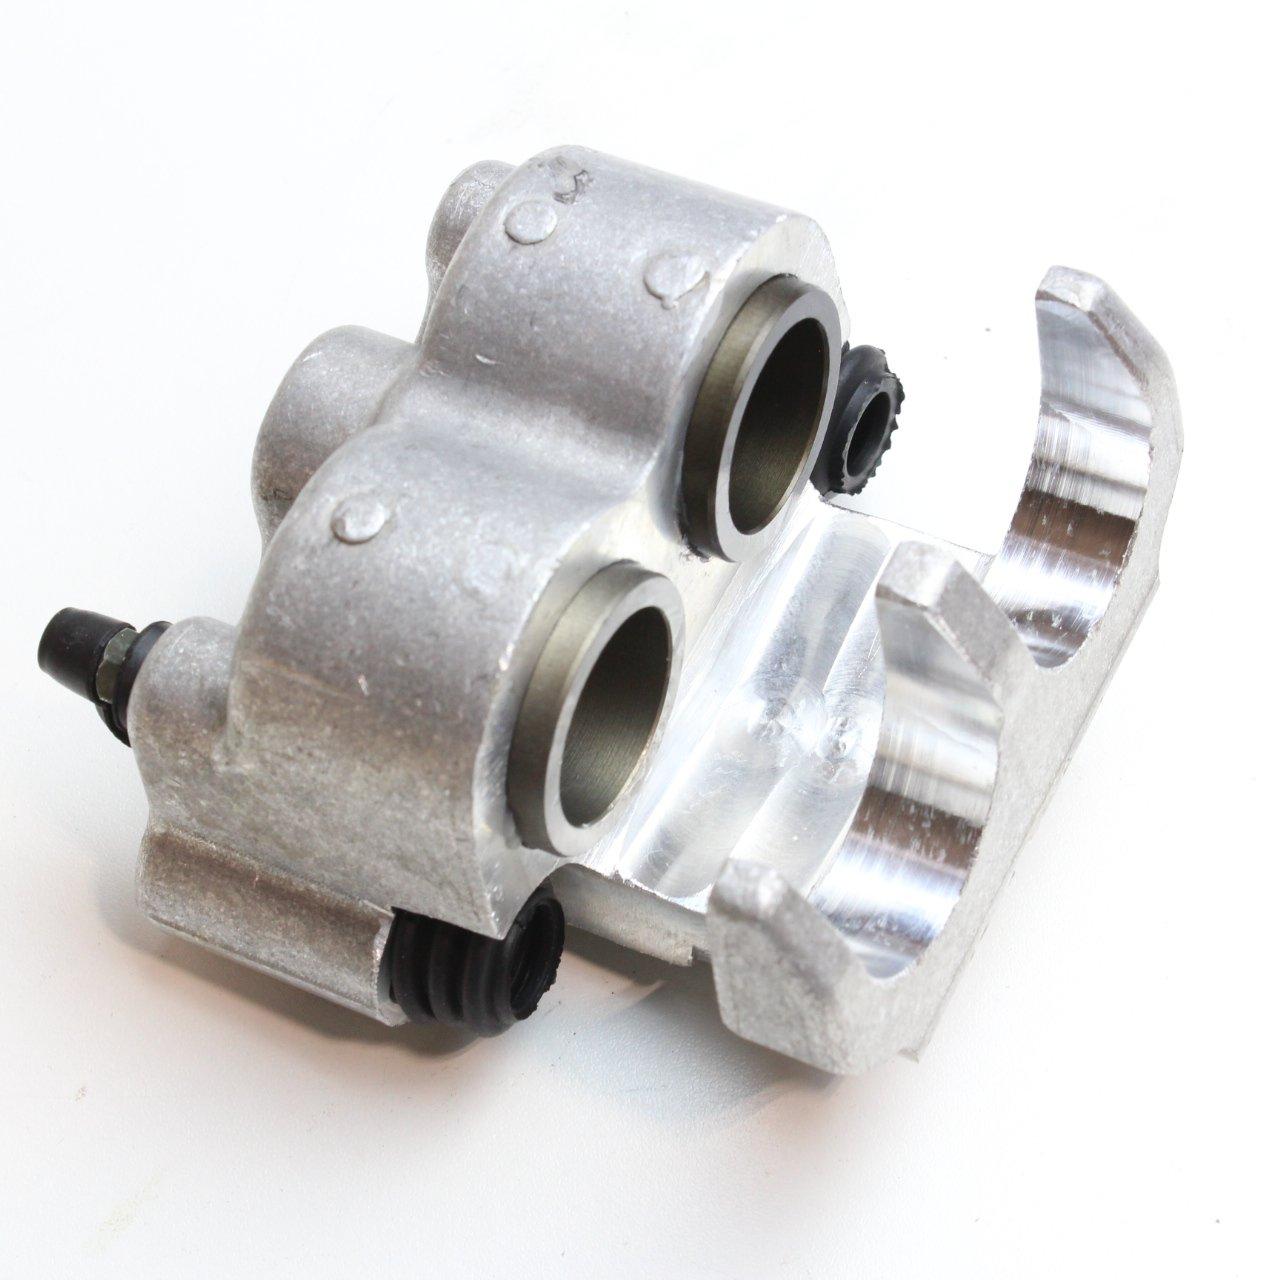 Brake Caliper Assembly 2015-2017 Polaris General RZR 4 S 900 1000 1912244 1912278